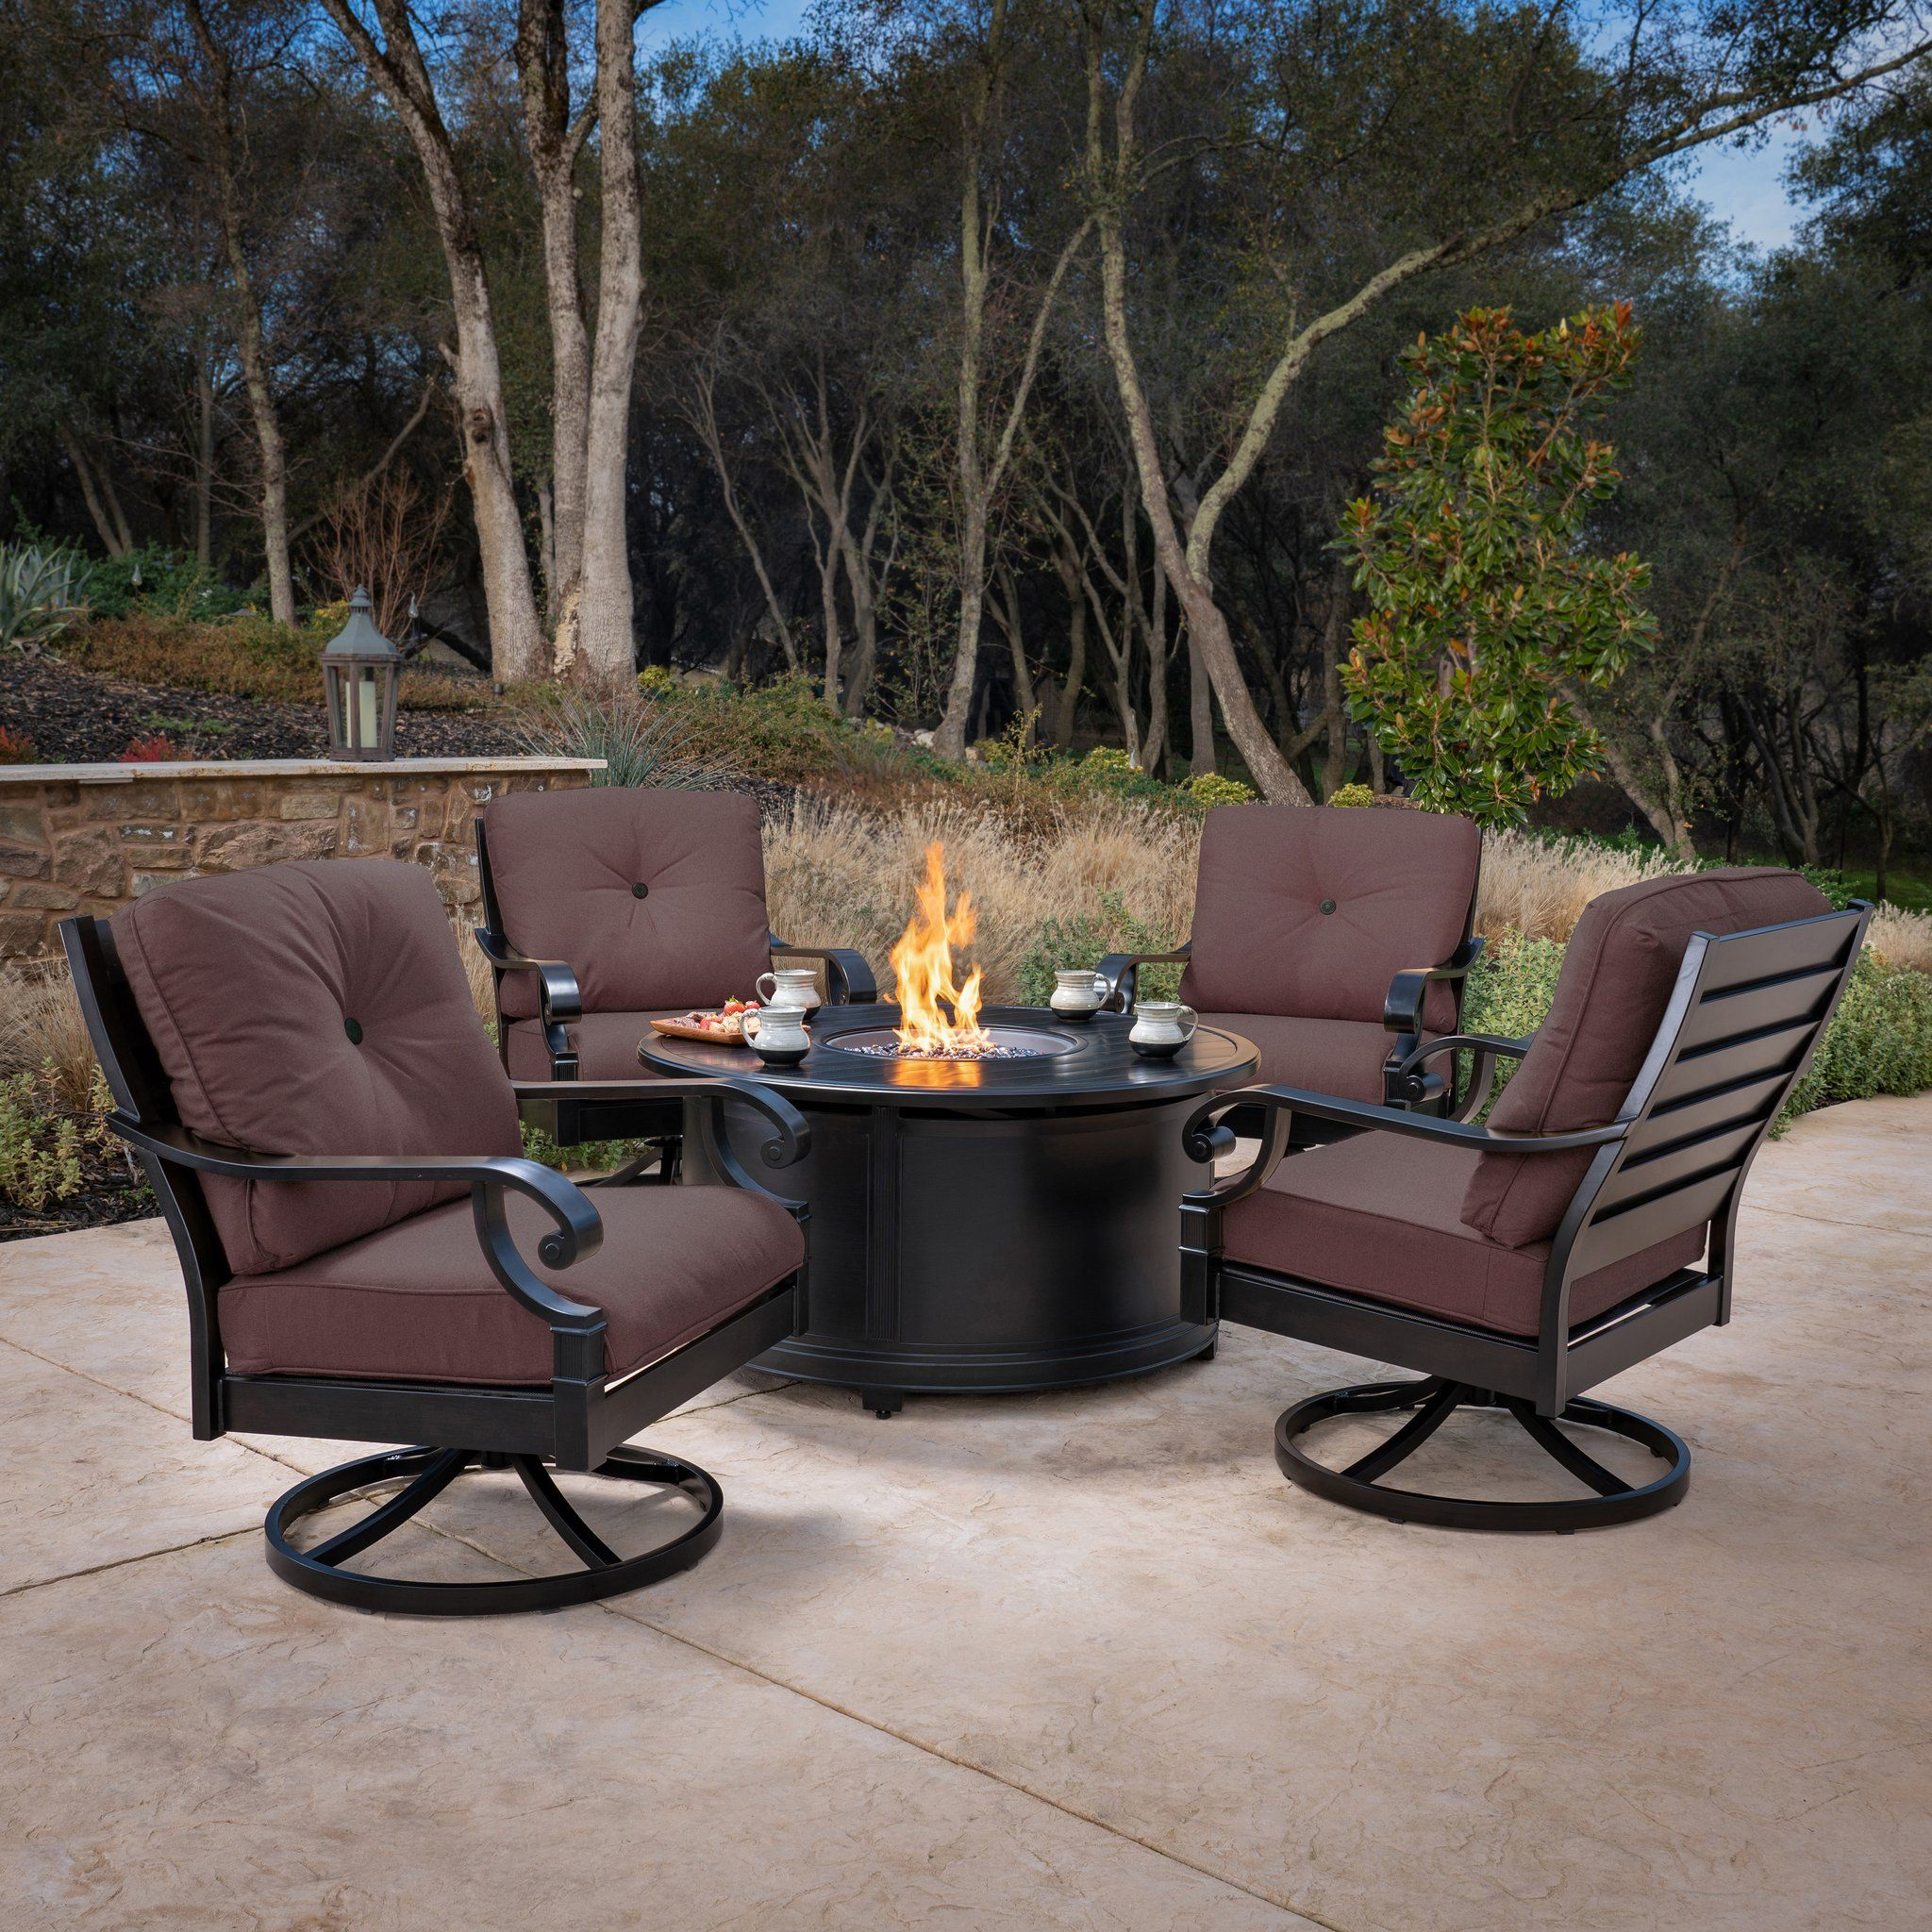 sunbrella patio furniture